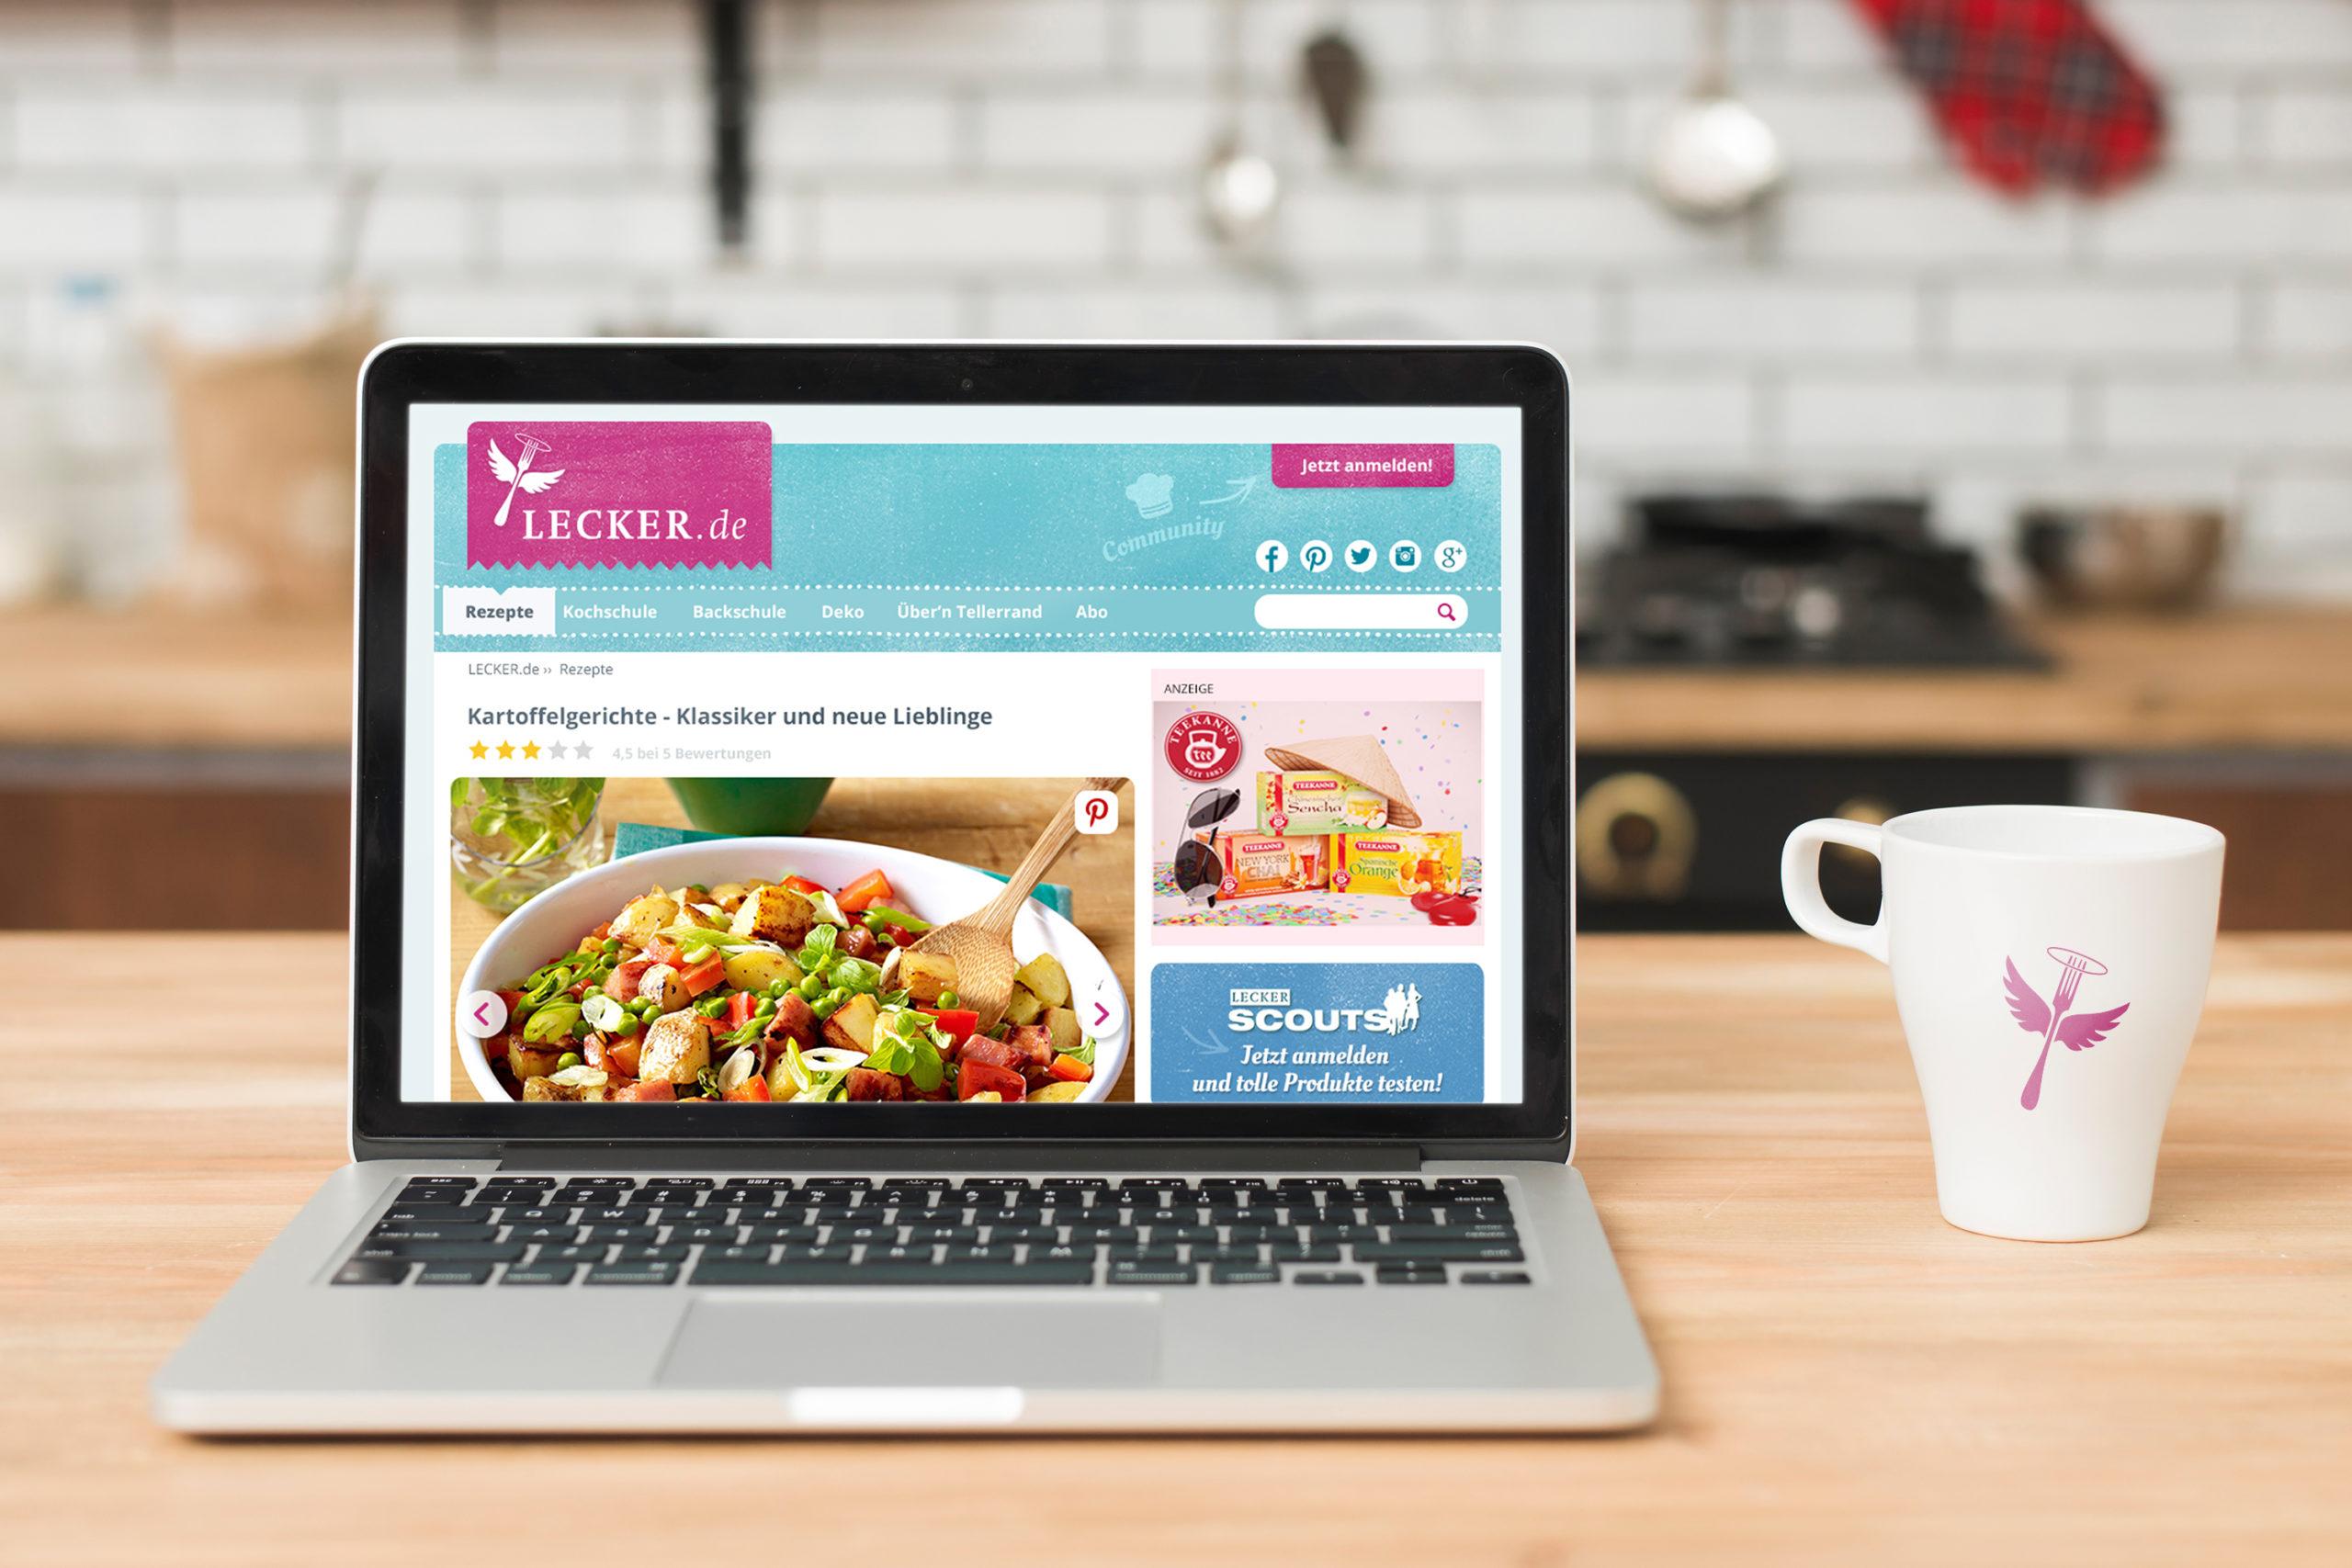 Lecker Backrezepte und Backen / responsive webdesign